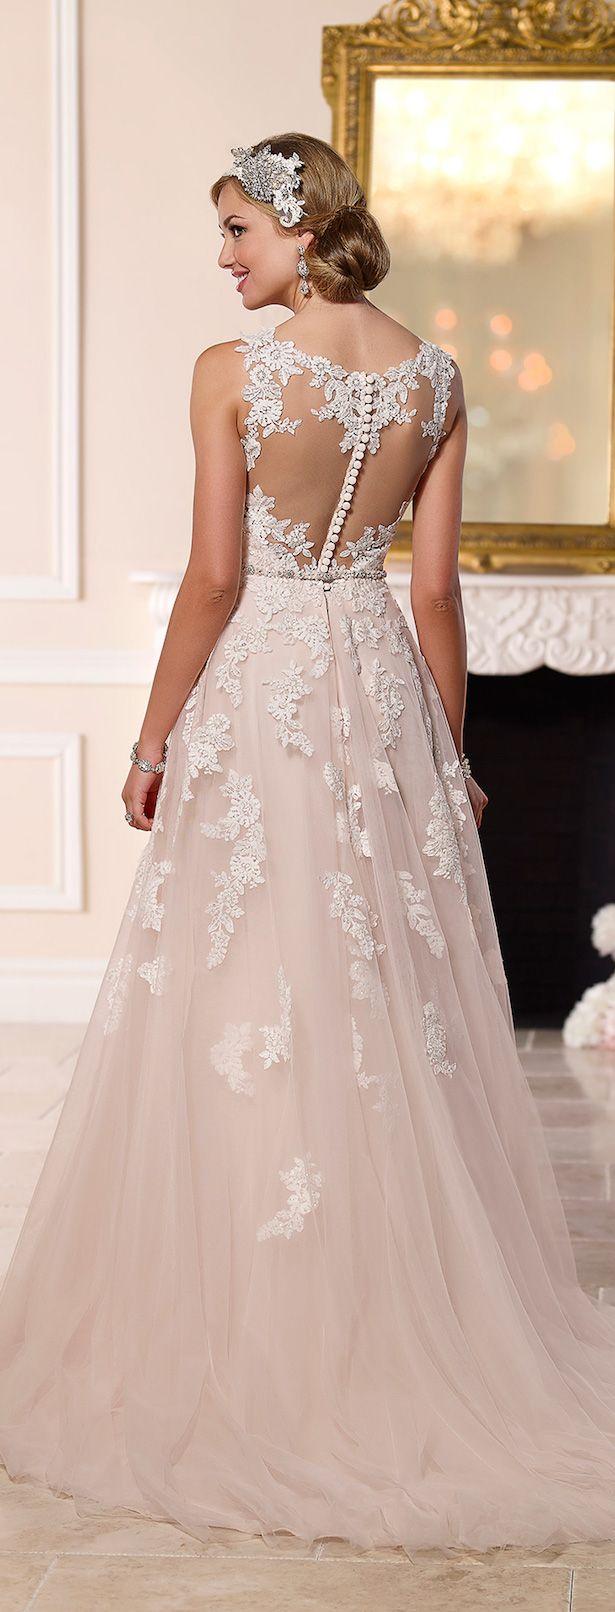 Stella York Spring 2016 Bridal Collection | Brautstyling ...